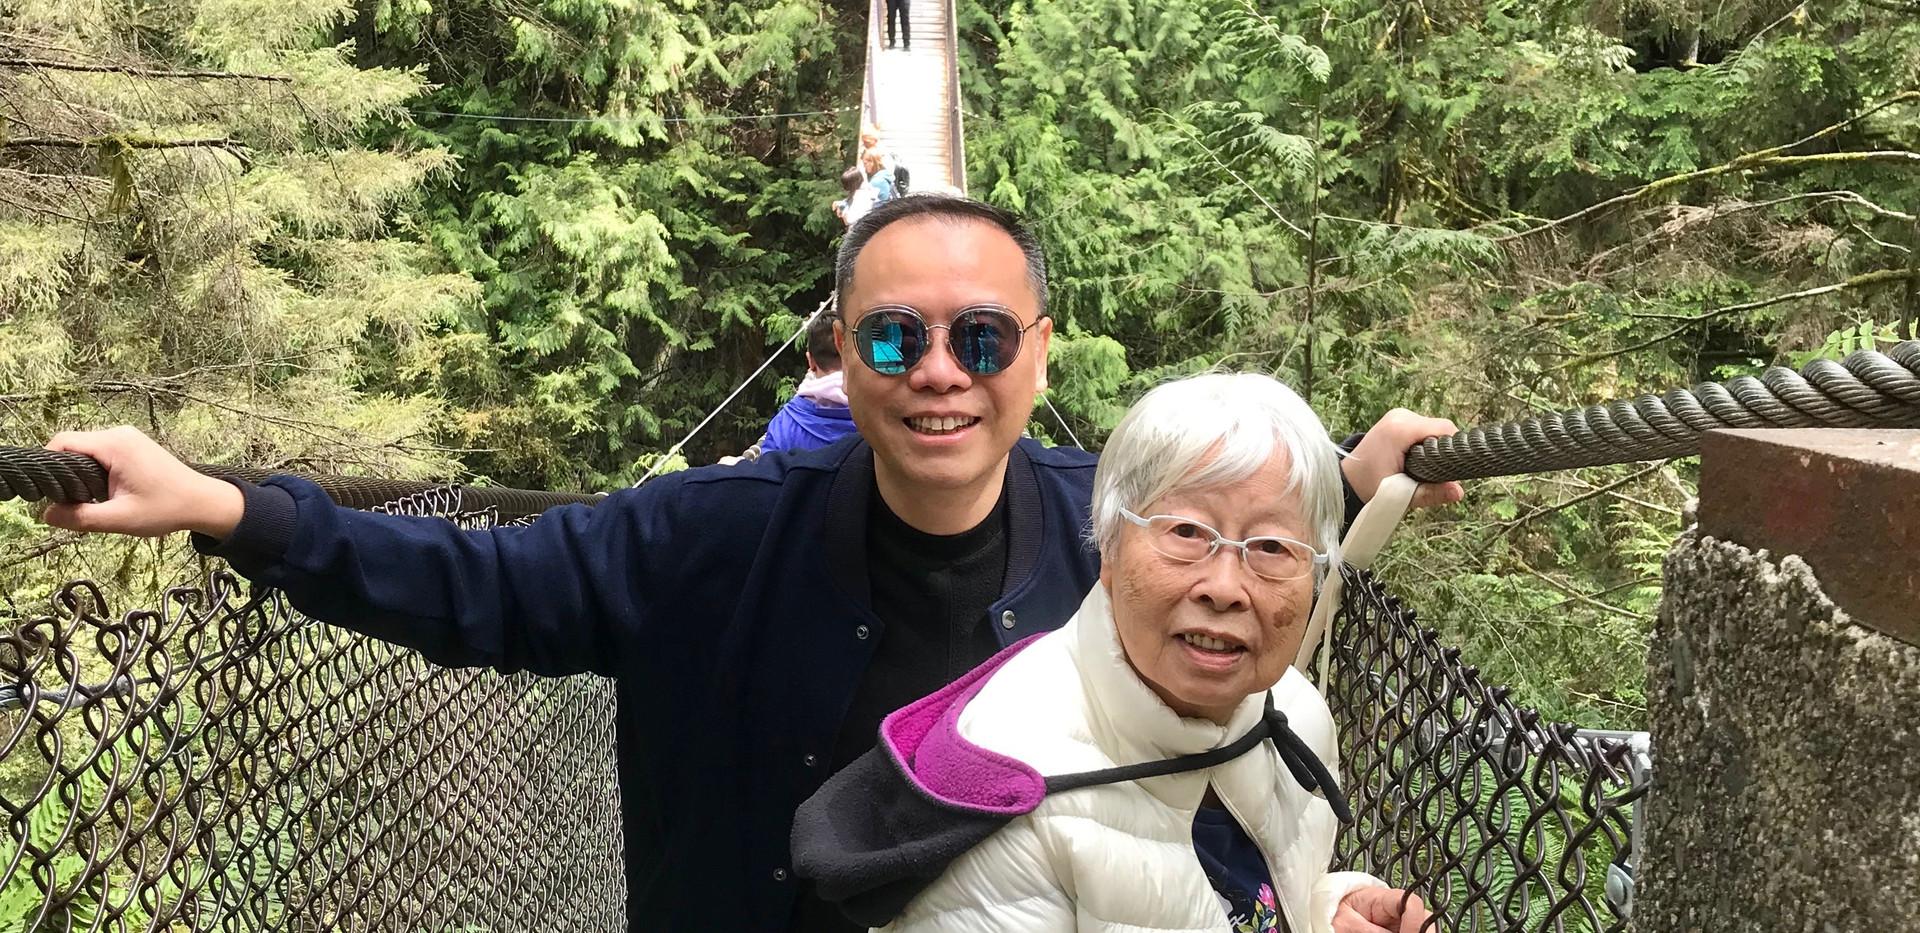 Vancouver, Canada May 2018